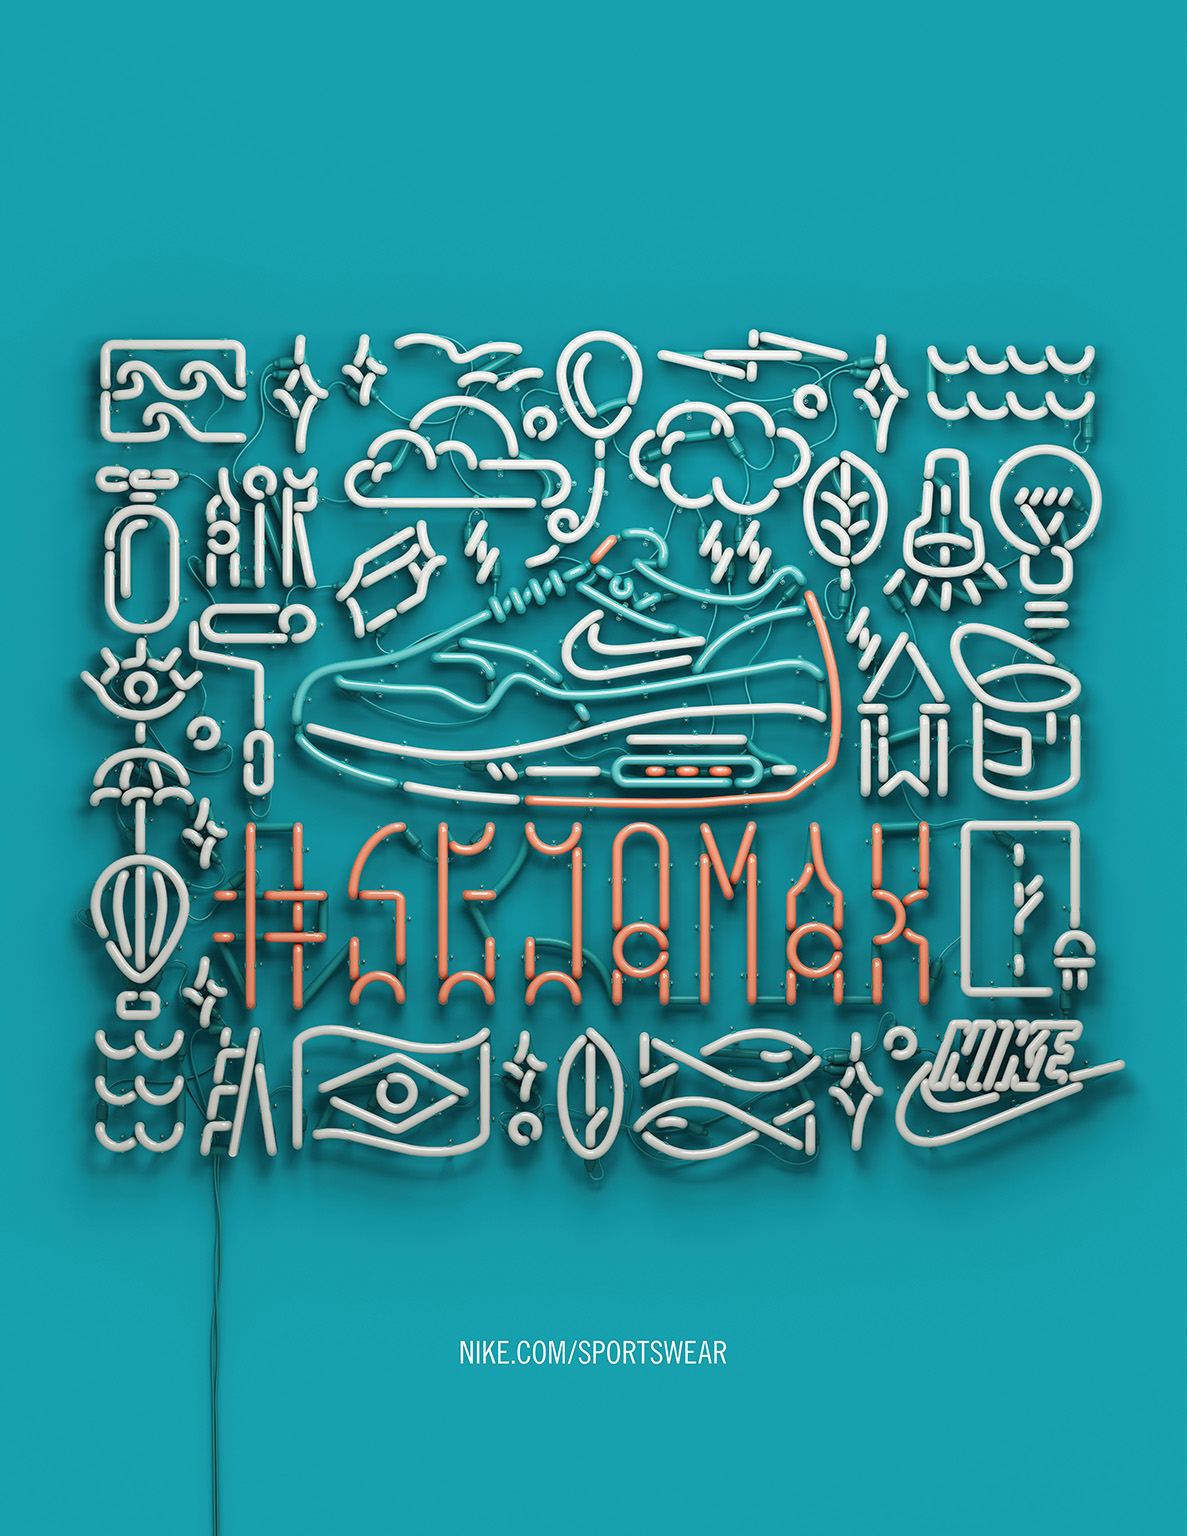 Nike,3dneon,neontype,tube,light,CGI,air max,airmax,Brasil,Signage,3dtypography,3D Type,pixação,nsw,neonsign